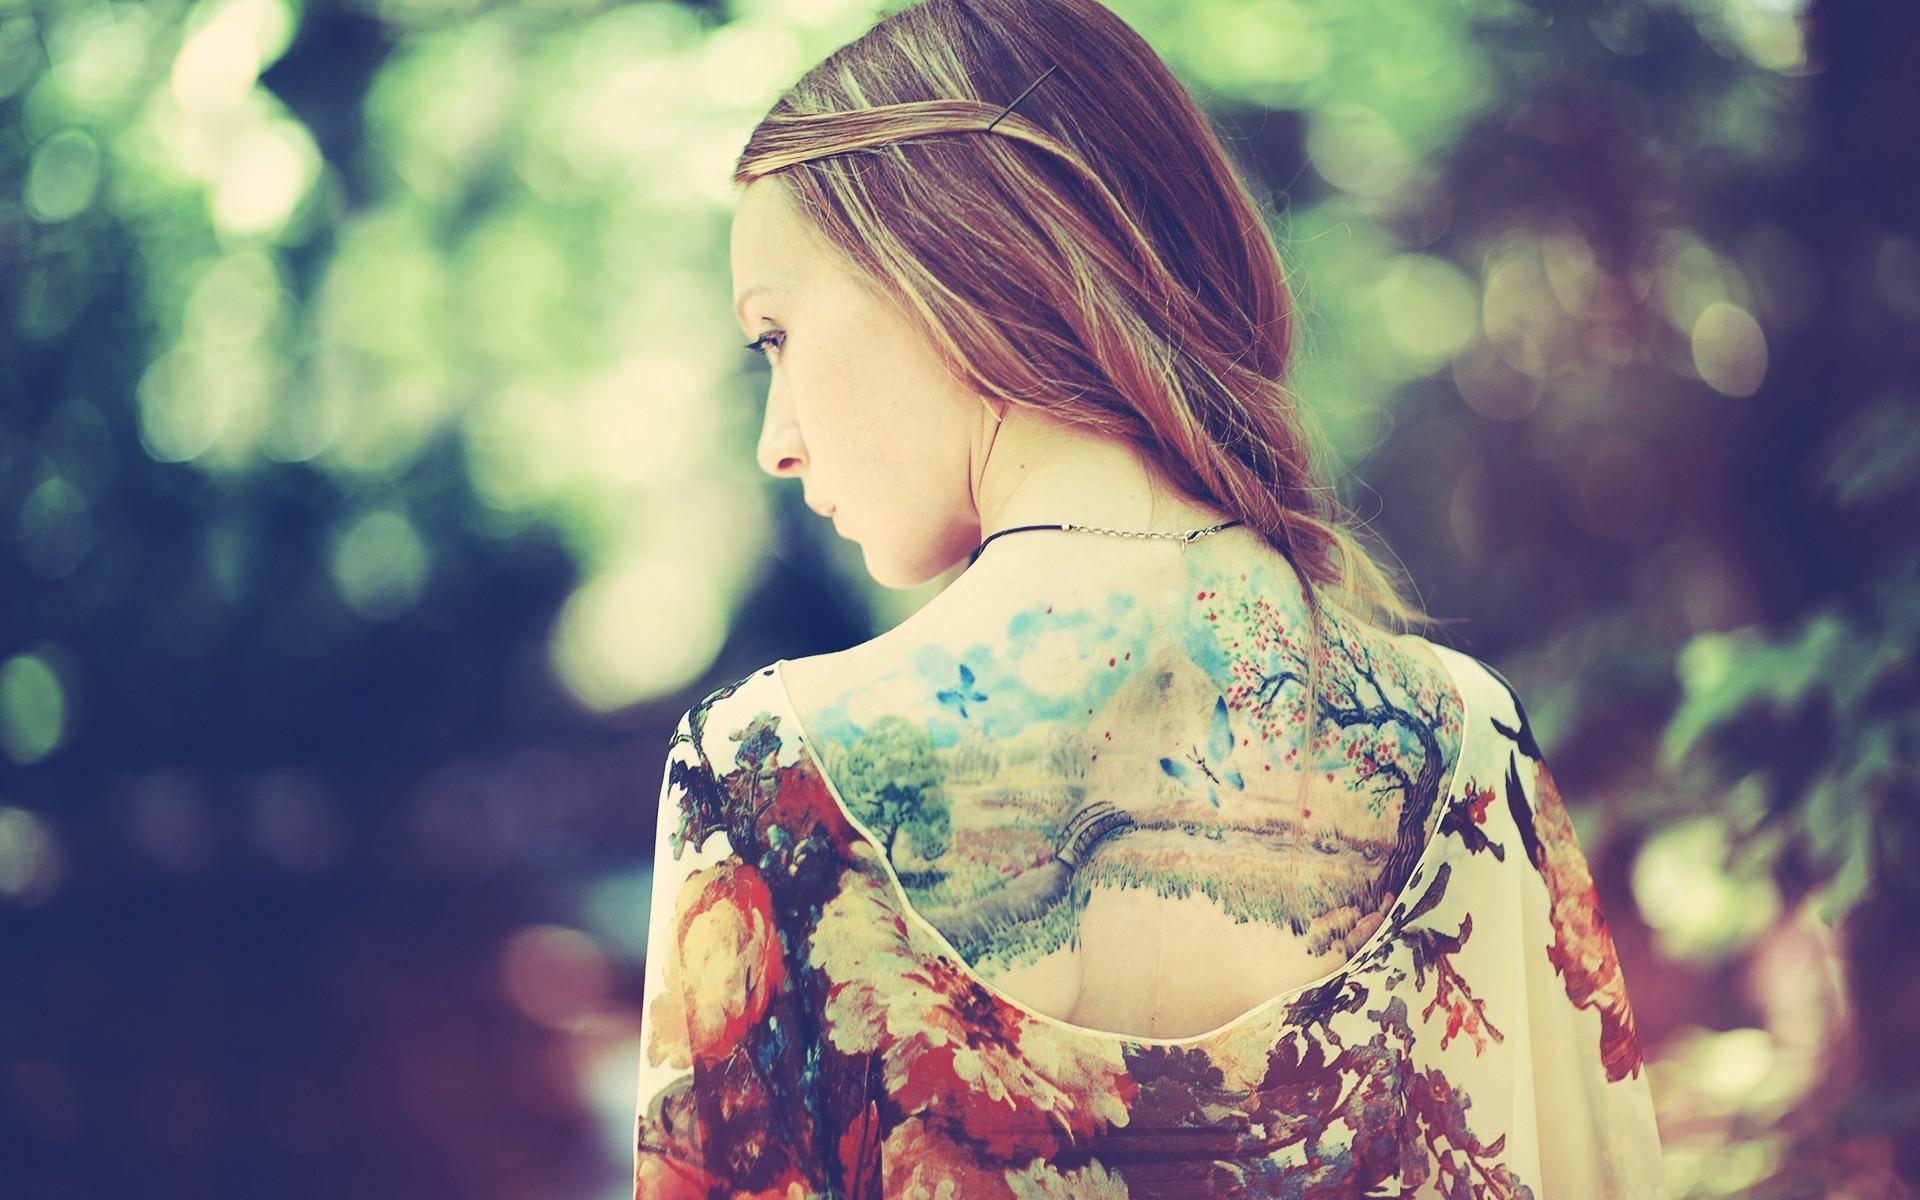 Back Dress Tattoos Nature Background Style Fashion